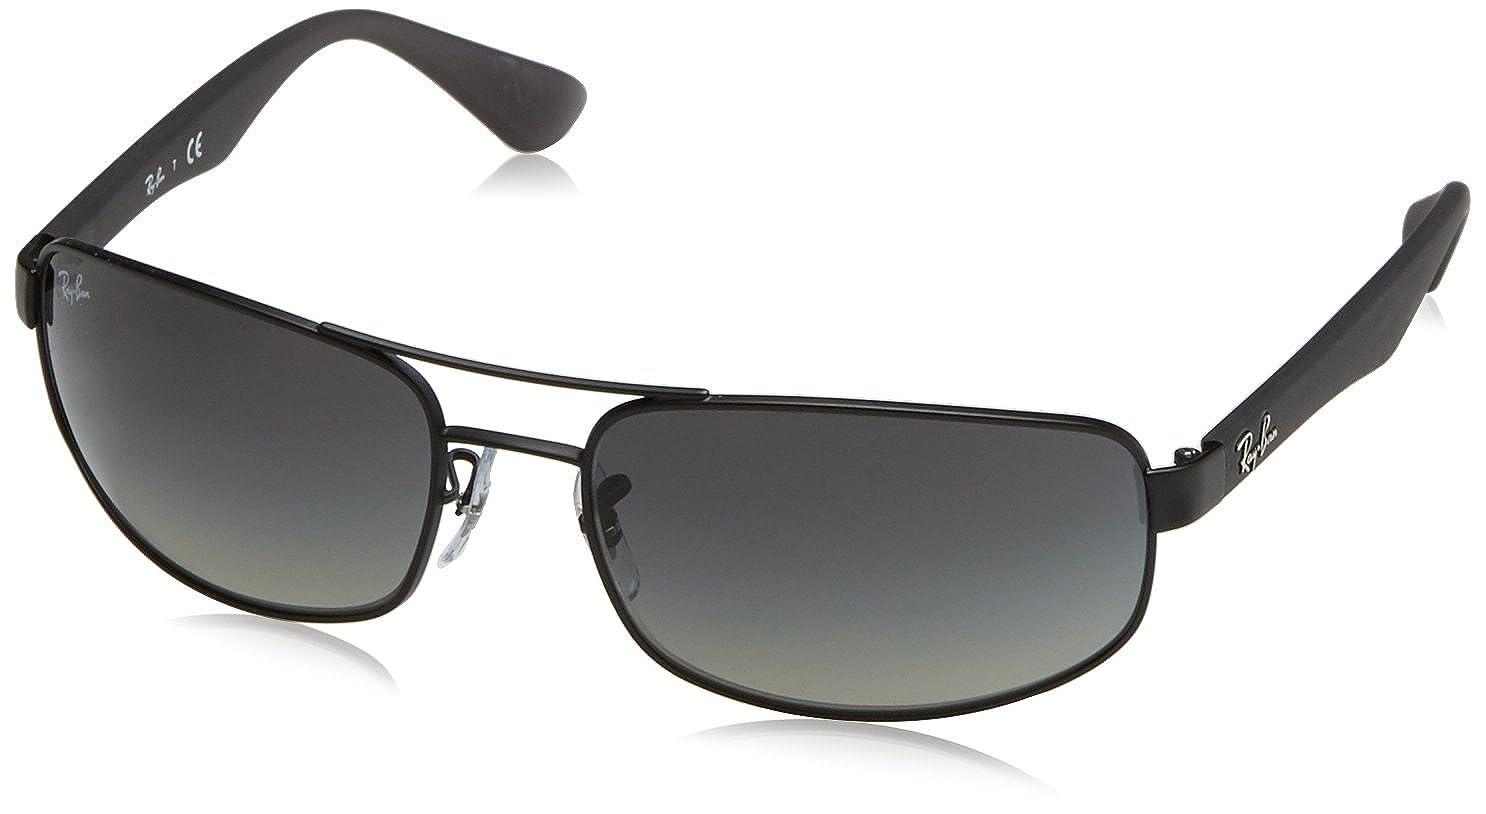 2c5f0006fe Ray-Ban RB 3445 64 002 58 Men s Polarized Sunglasses